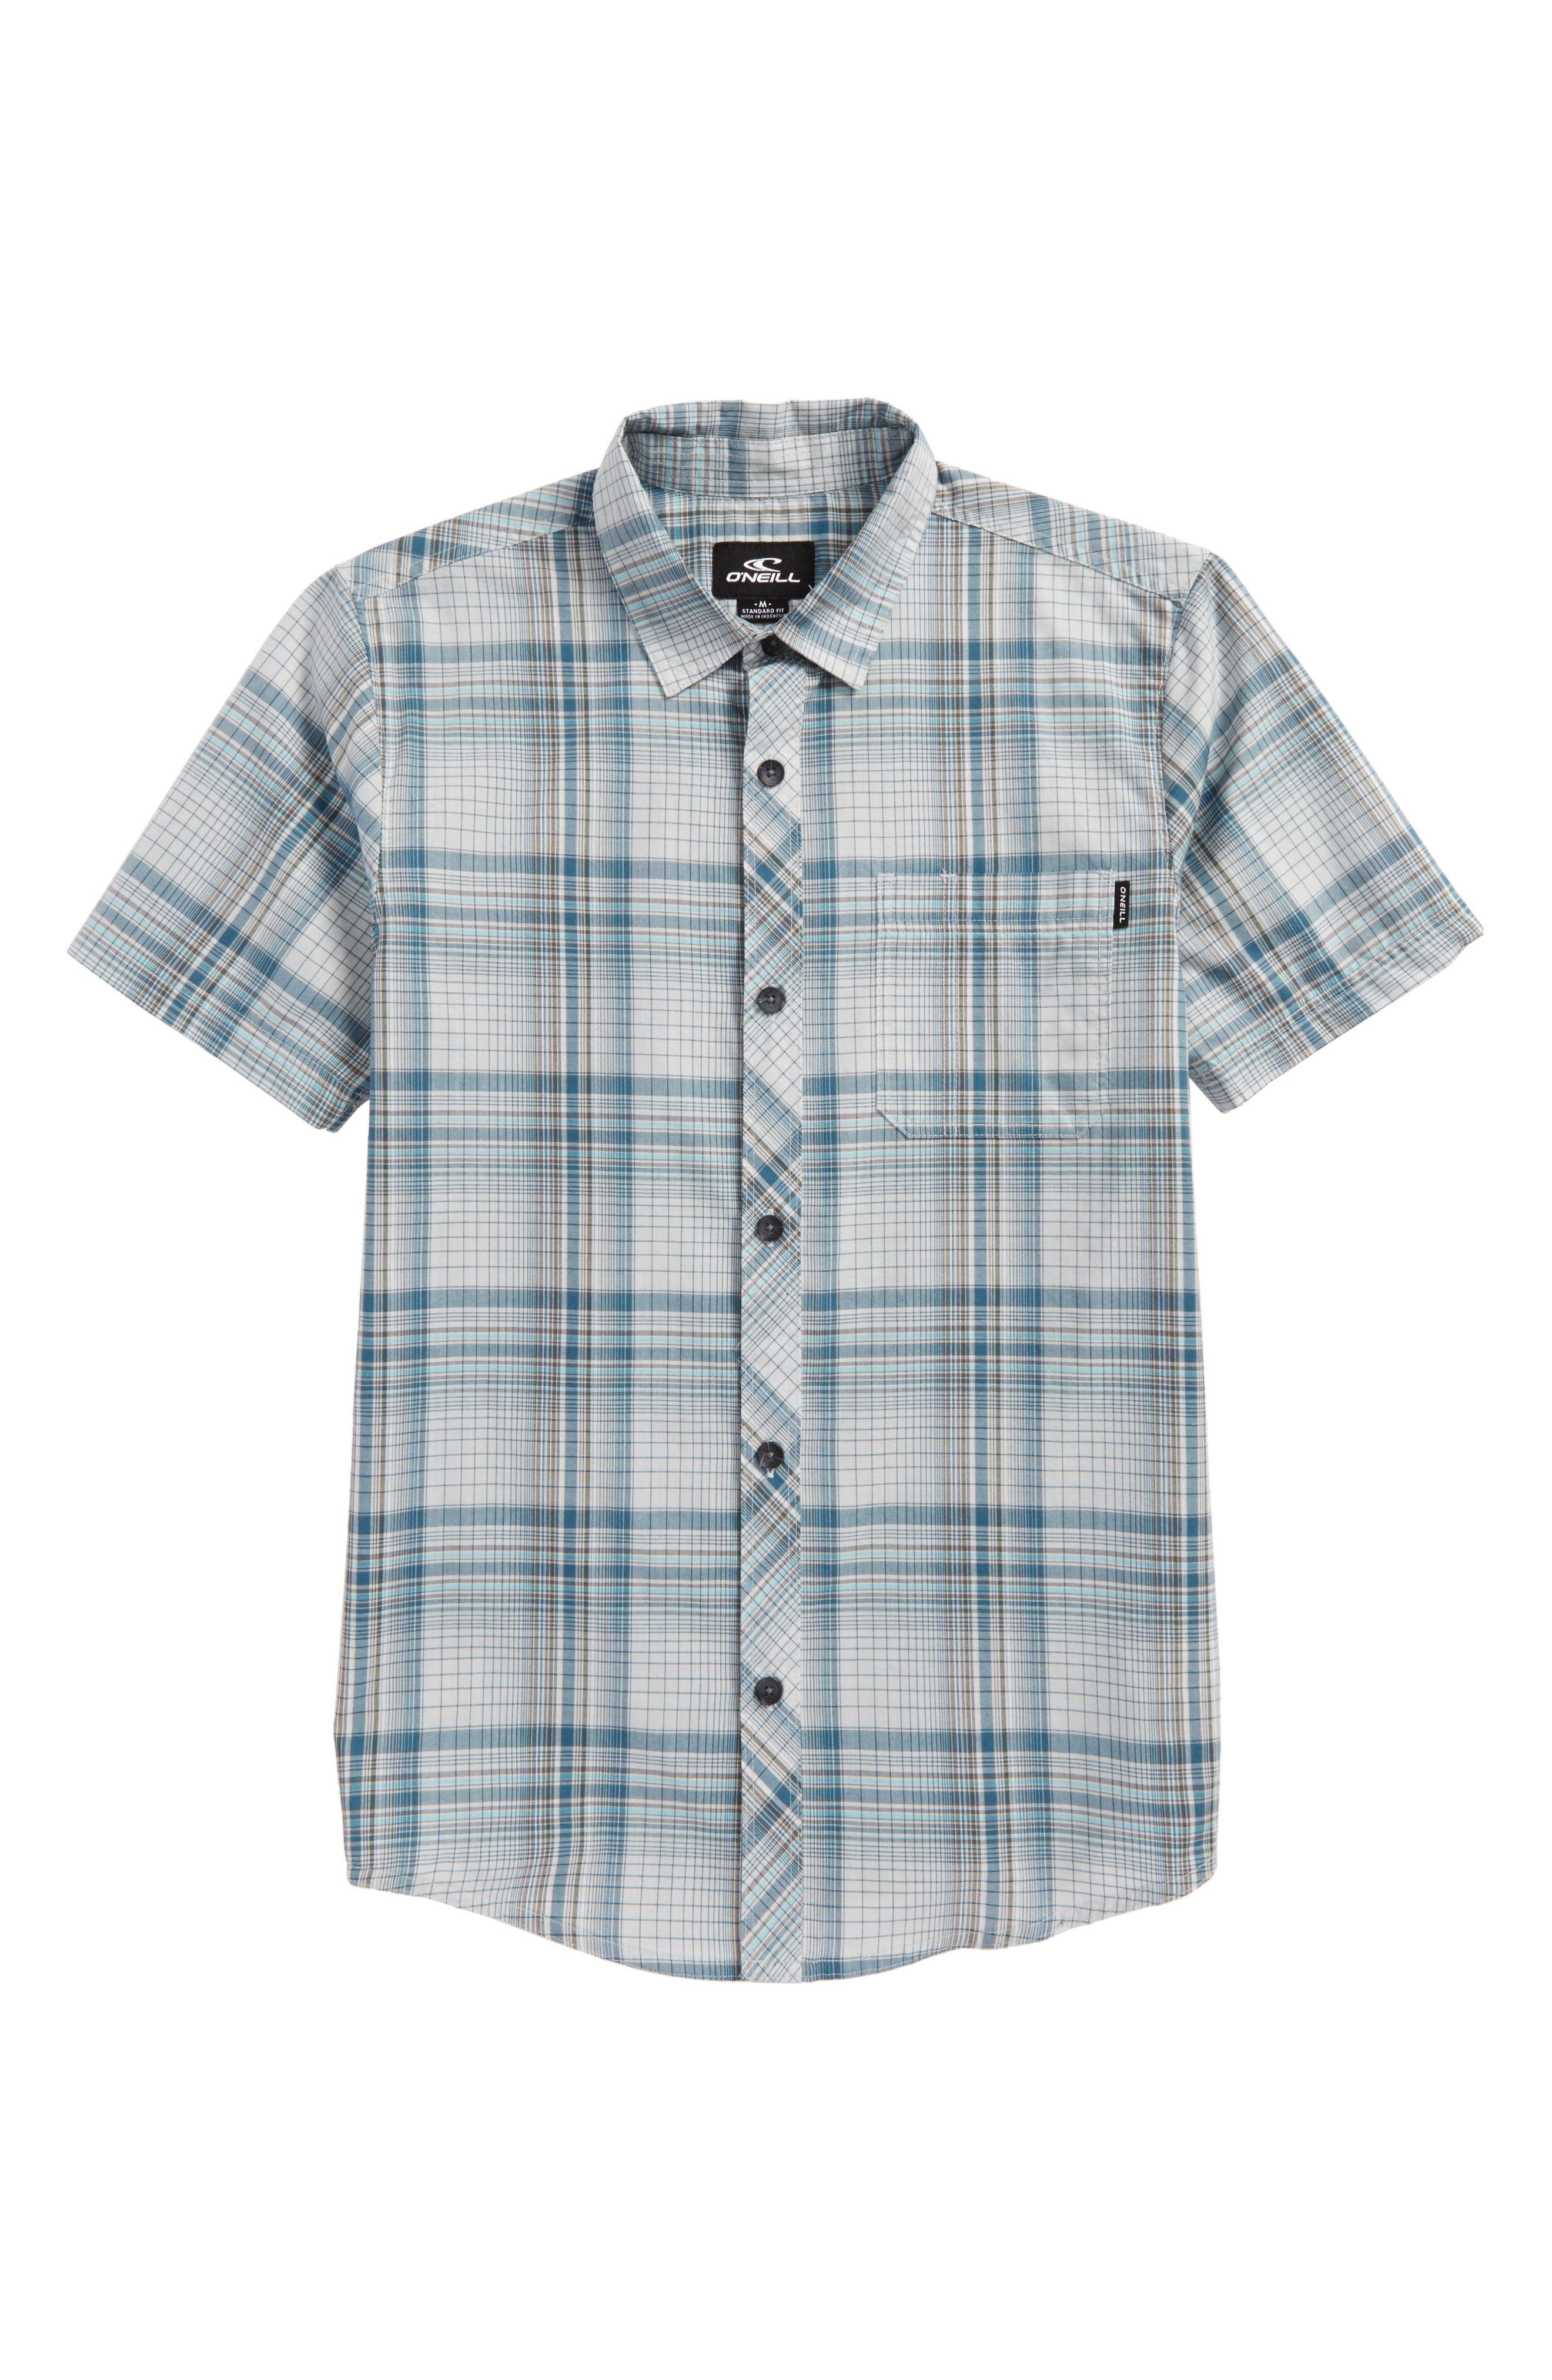 Sturghill Plaid Woven Shirt,                         Main,                         color,